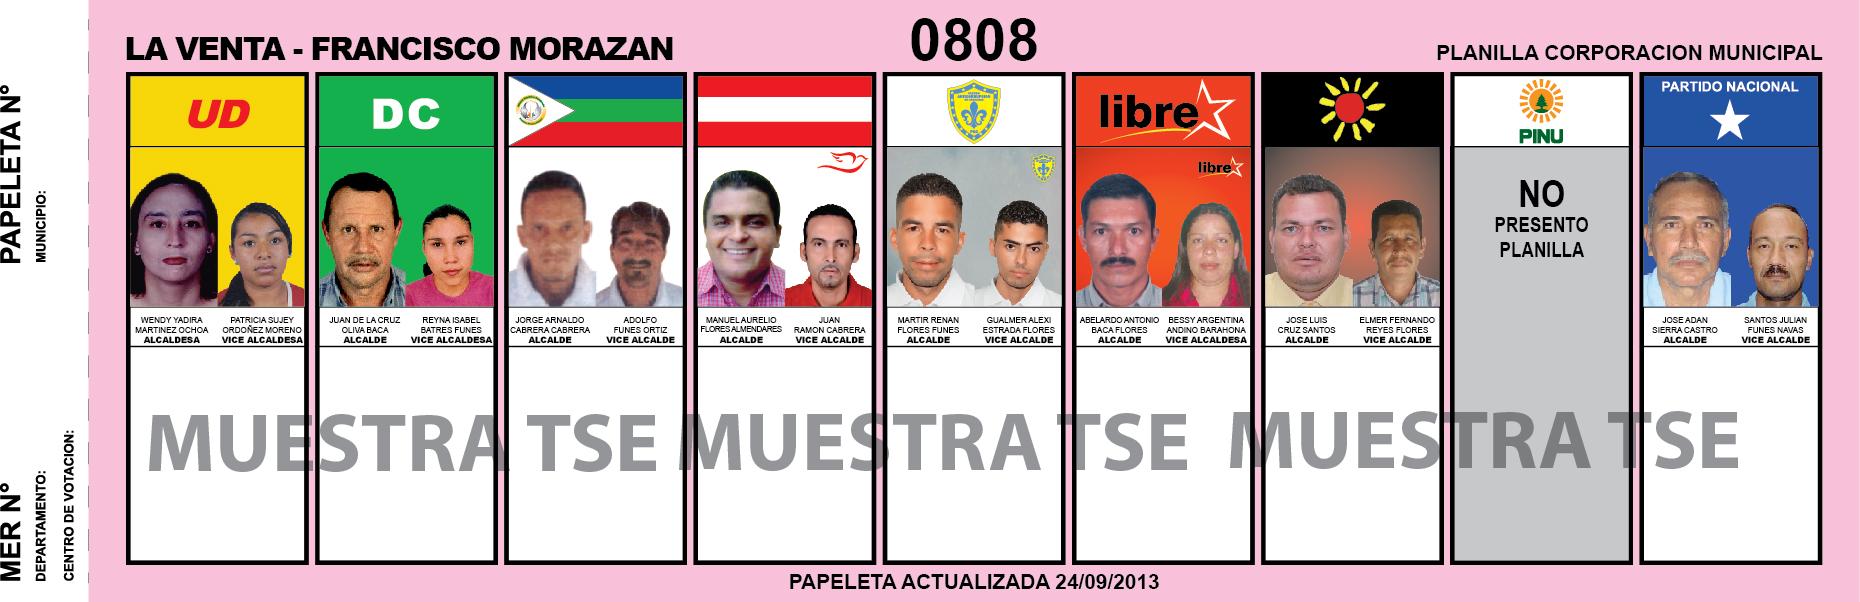 CANDIDATOS 2013 MUNICIPIO LA VENTA - FRANCISCO MORAZAN - HONDURAS